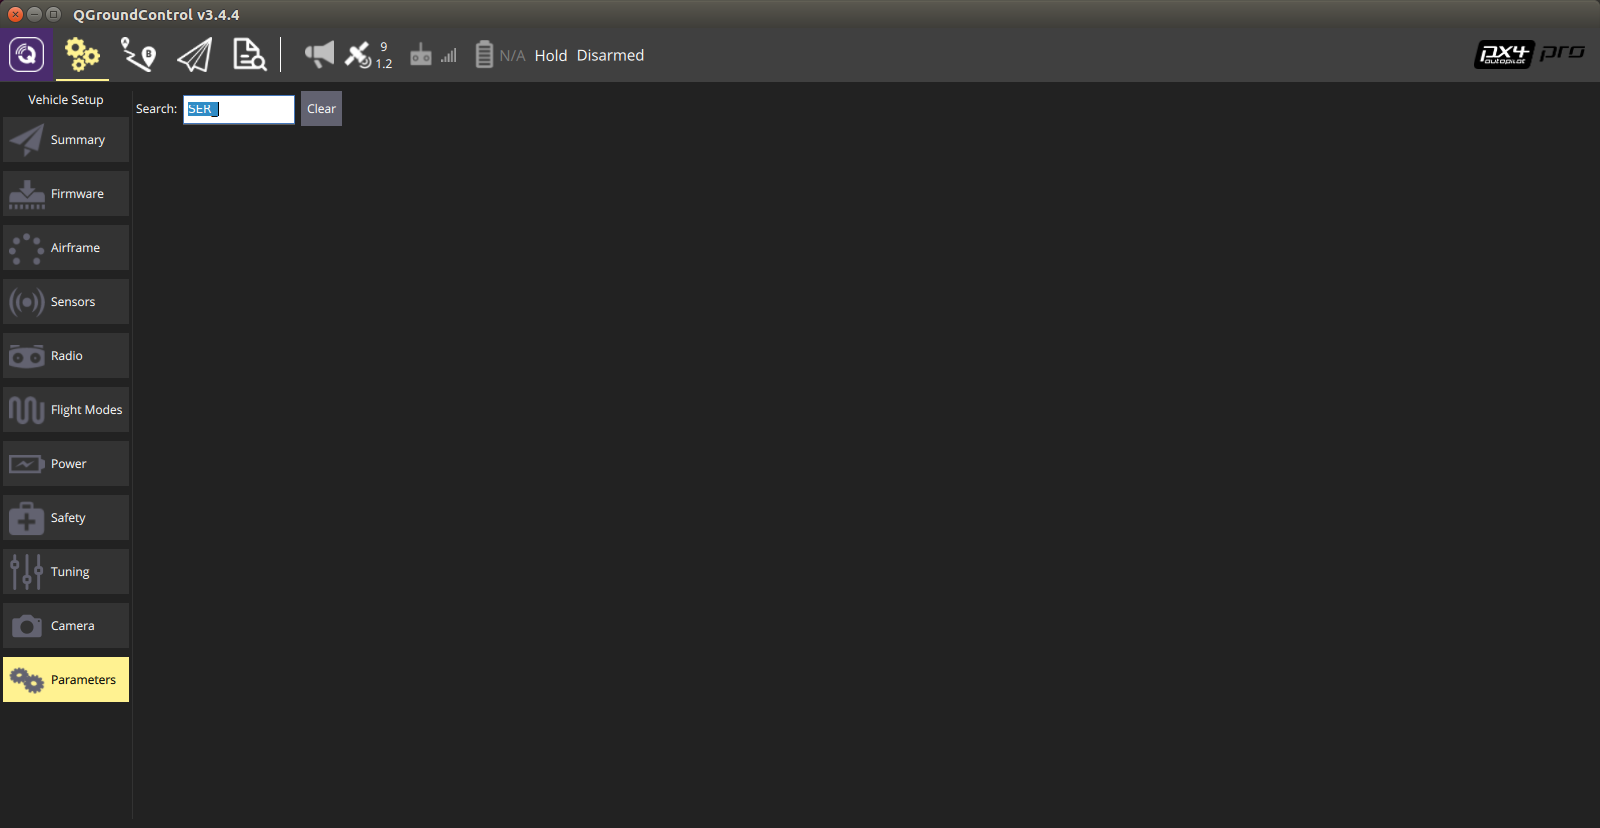 Use Raspberry pi to control Pixhawk4 - MAVSDK - PX4 Discussion Forum